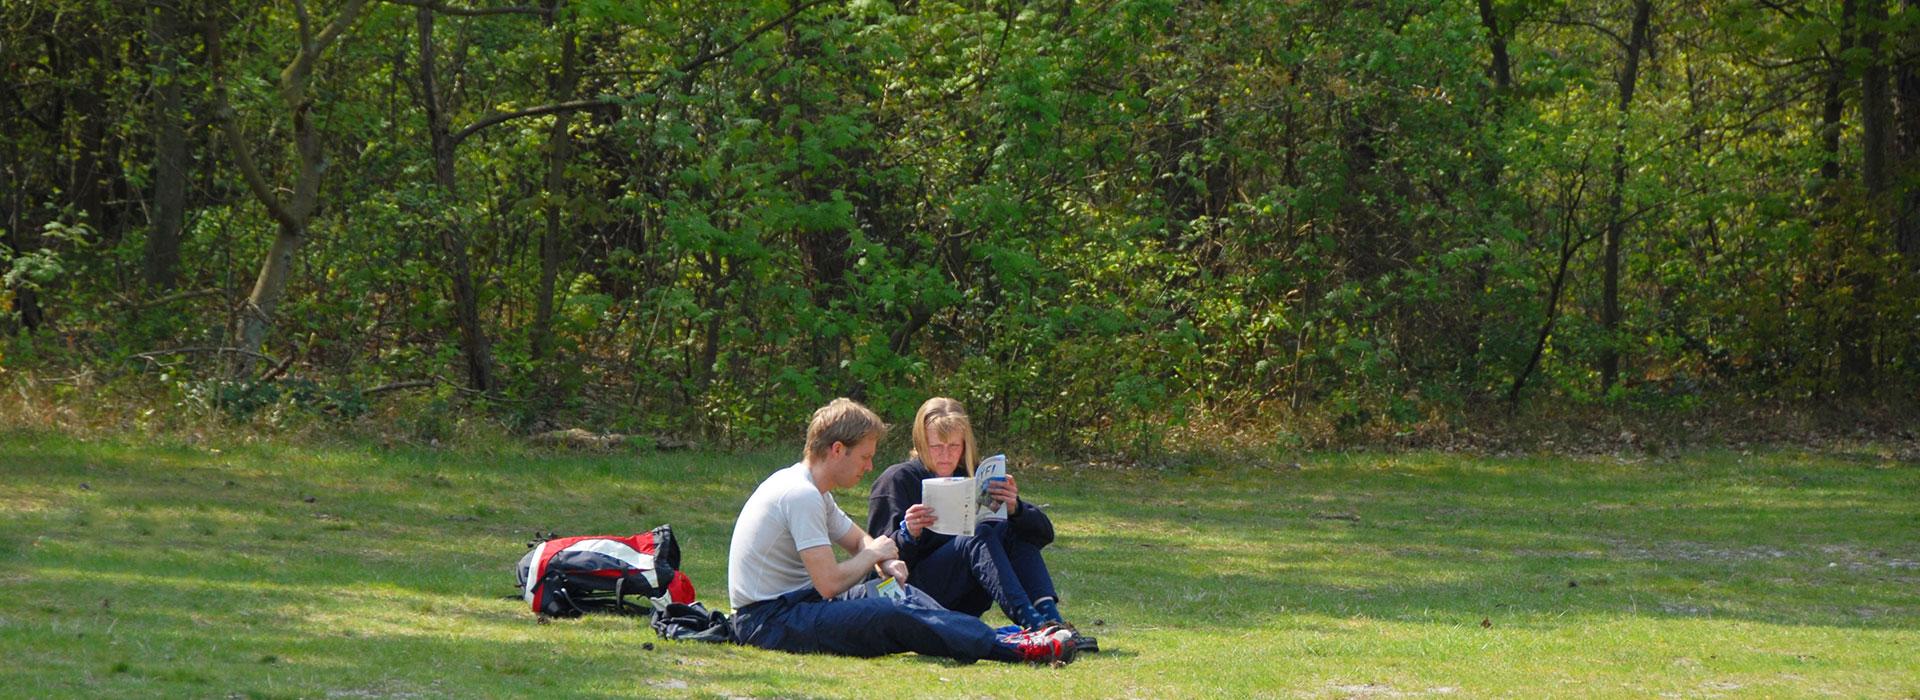 Dagtrip-Schiermonnikoog-vakantie-in-Friesland-Ljeppershiem-vakantiepark-picknicken